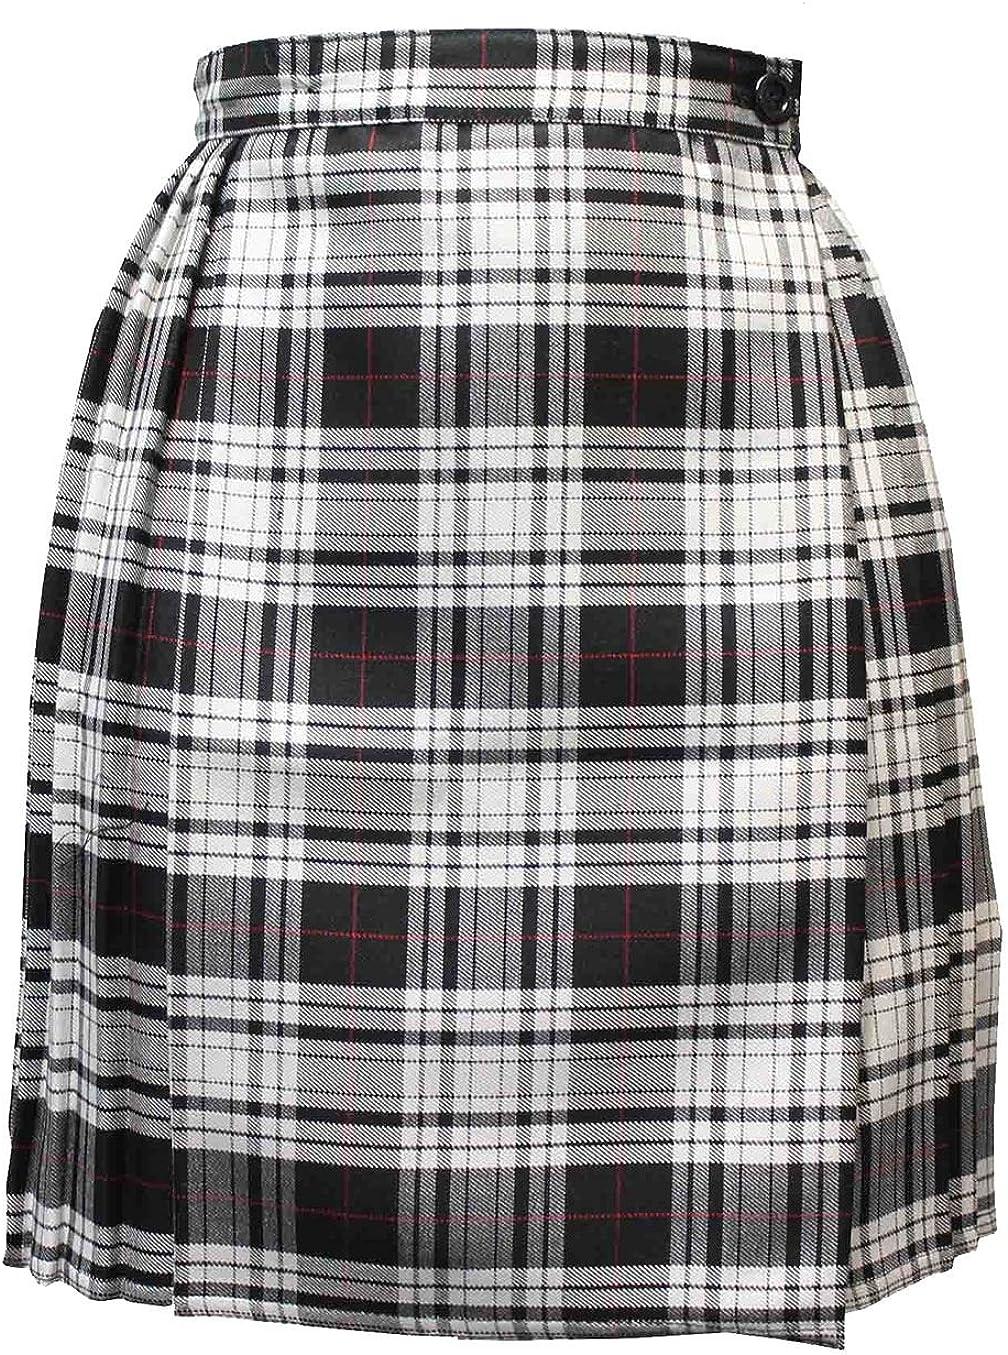 Rimi Hanger Womens Wrap Over Pleated Tartan Skirt Ladies Fancy Party Wear Short Midi Skirt US 4-20